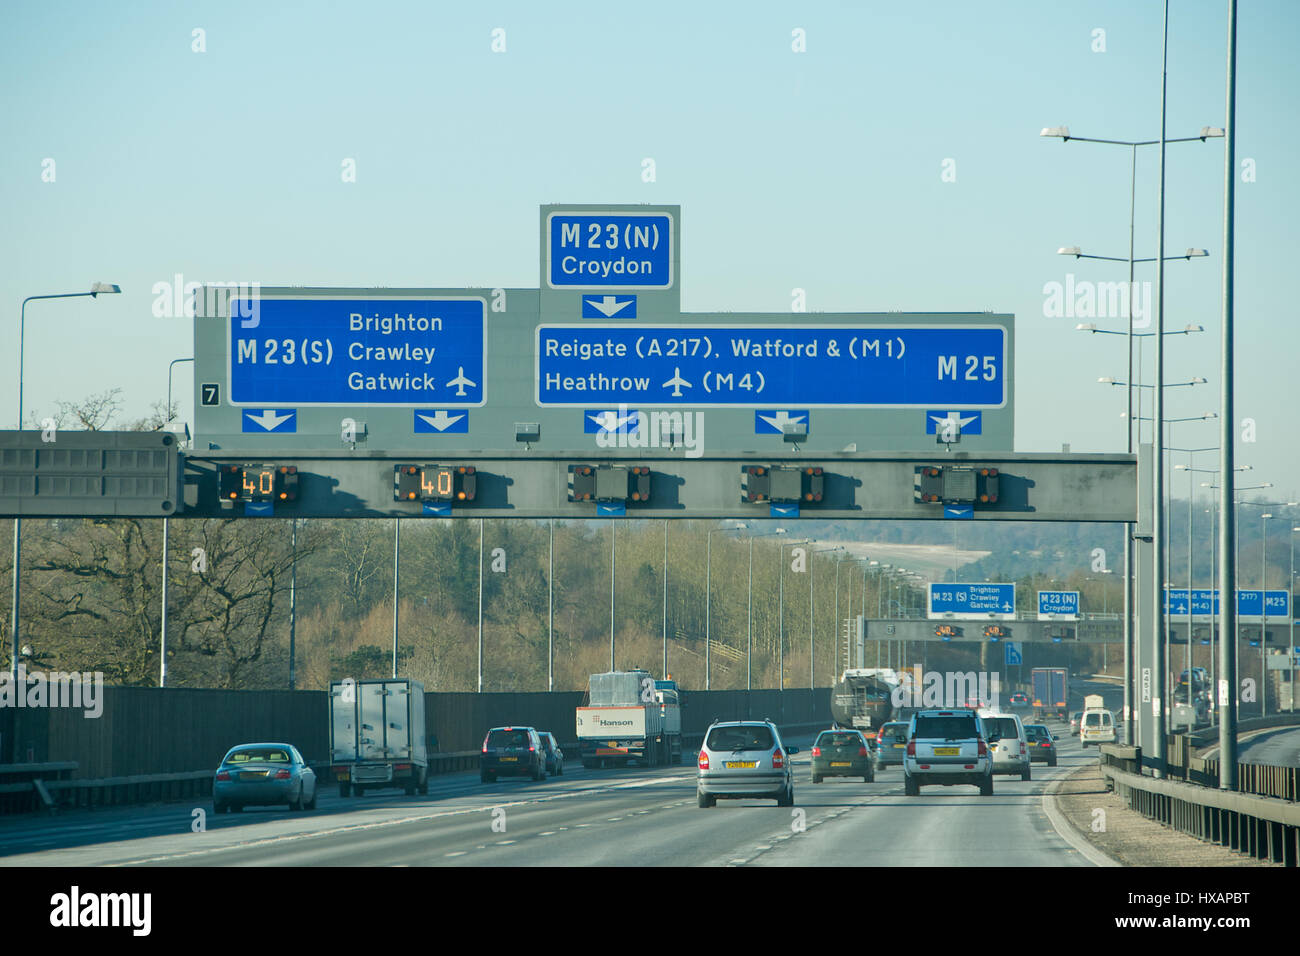 The M25 motorway in Surrey, England - Stock Image